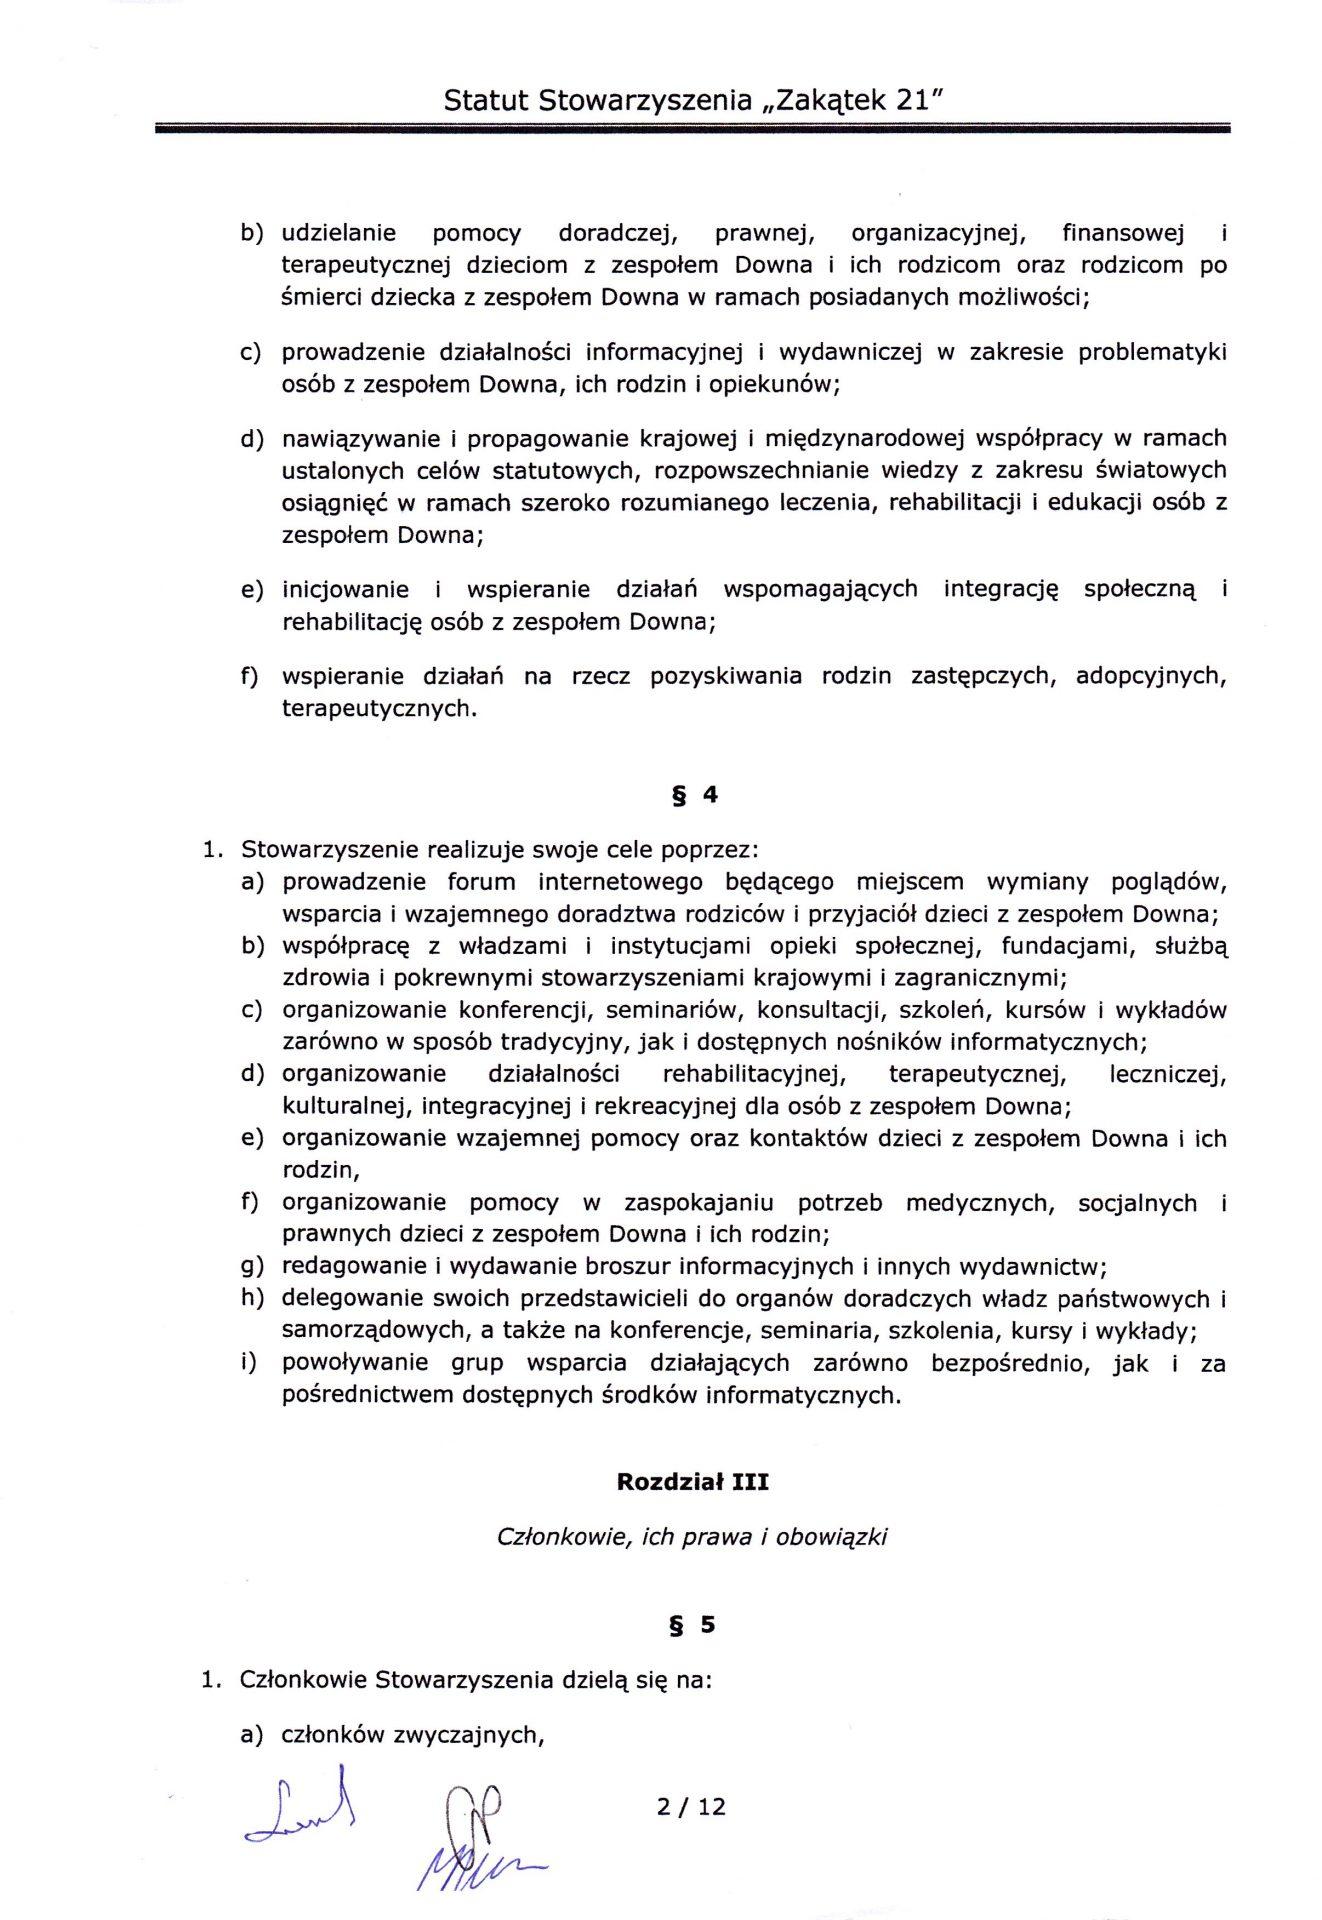 strona druga statutu